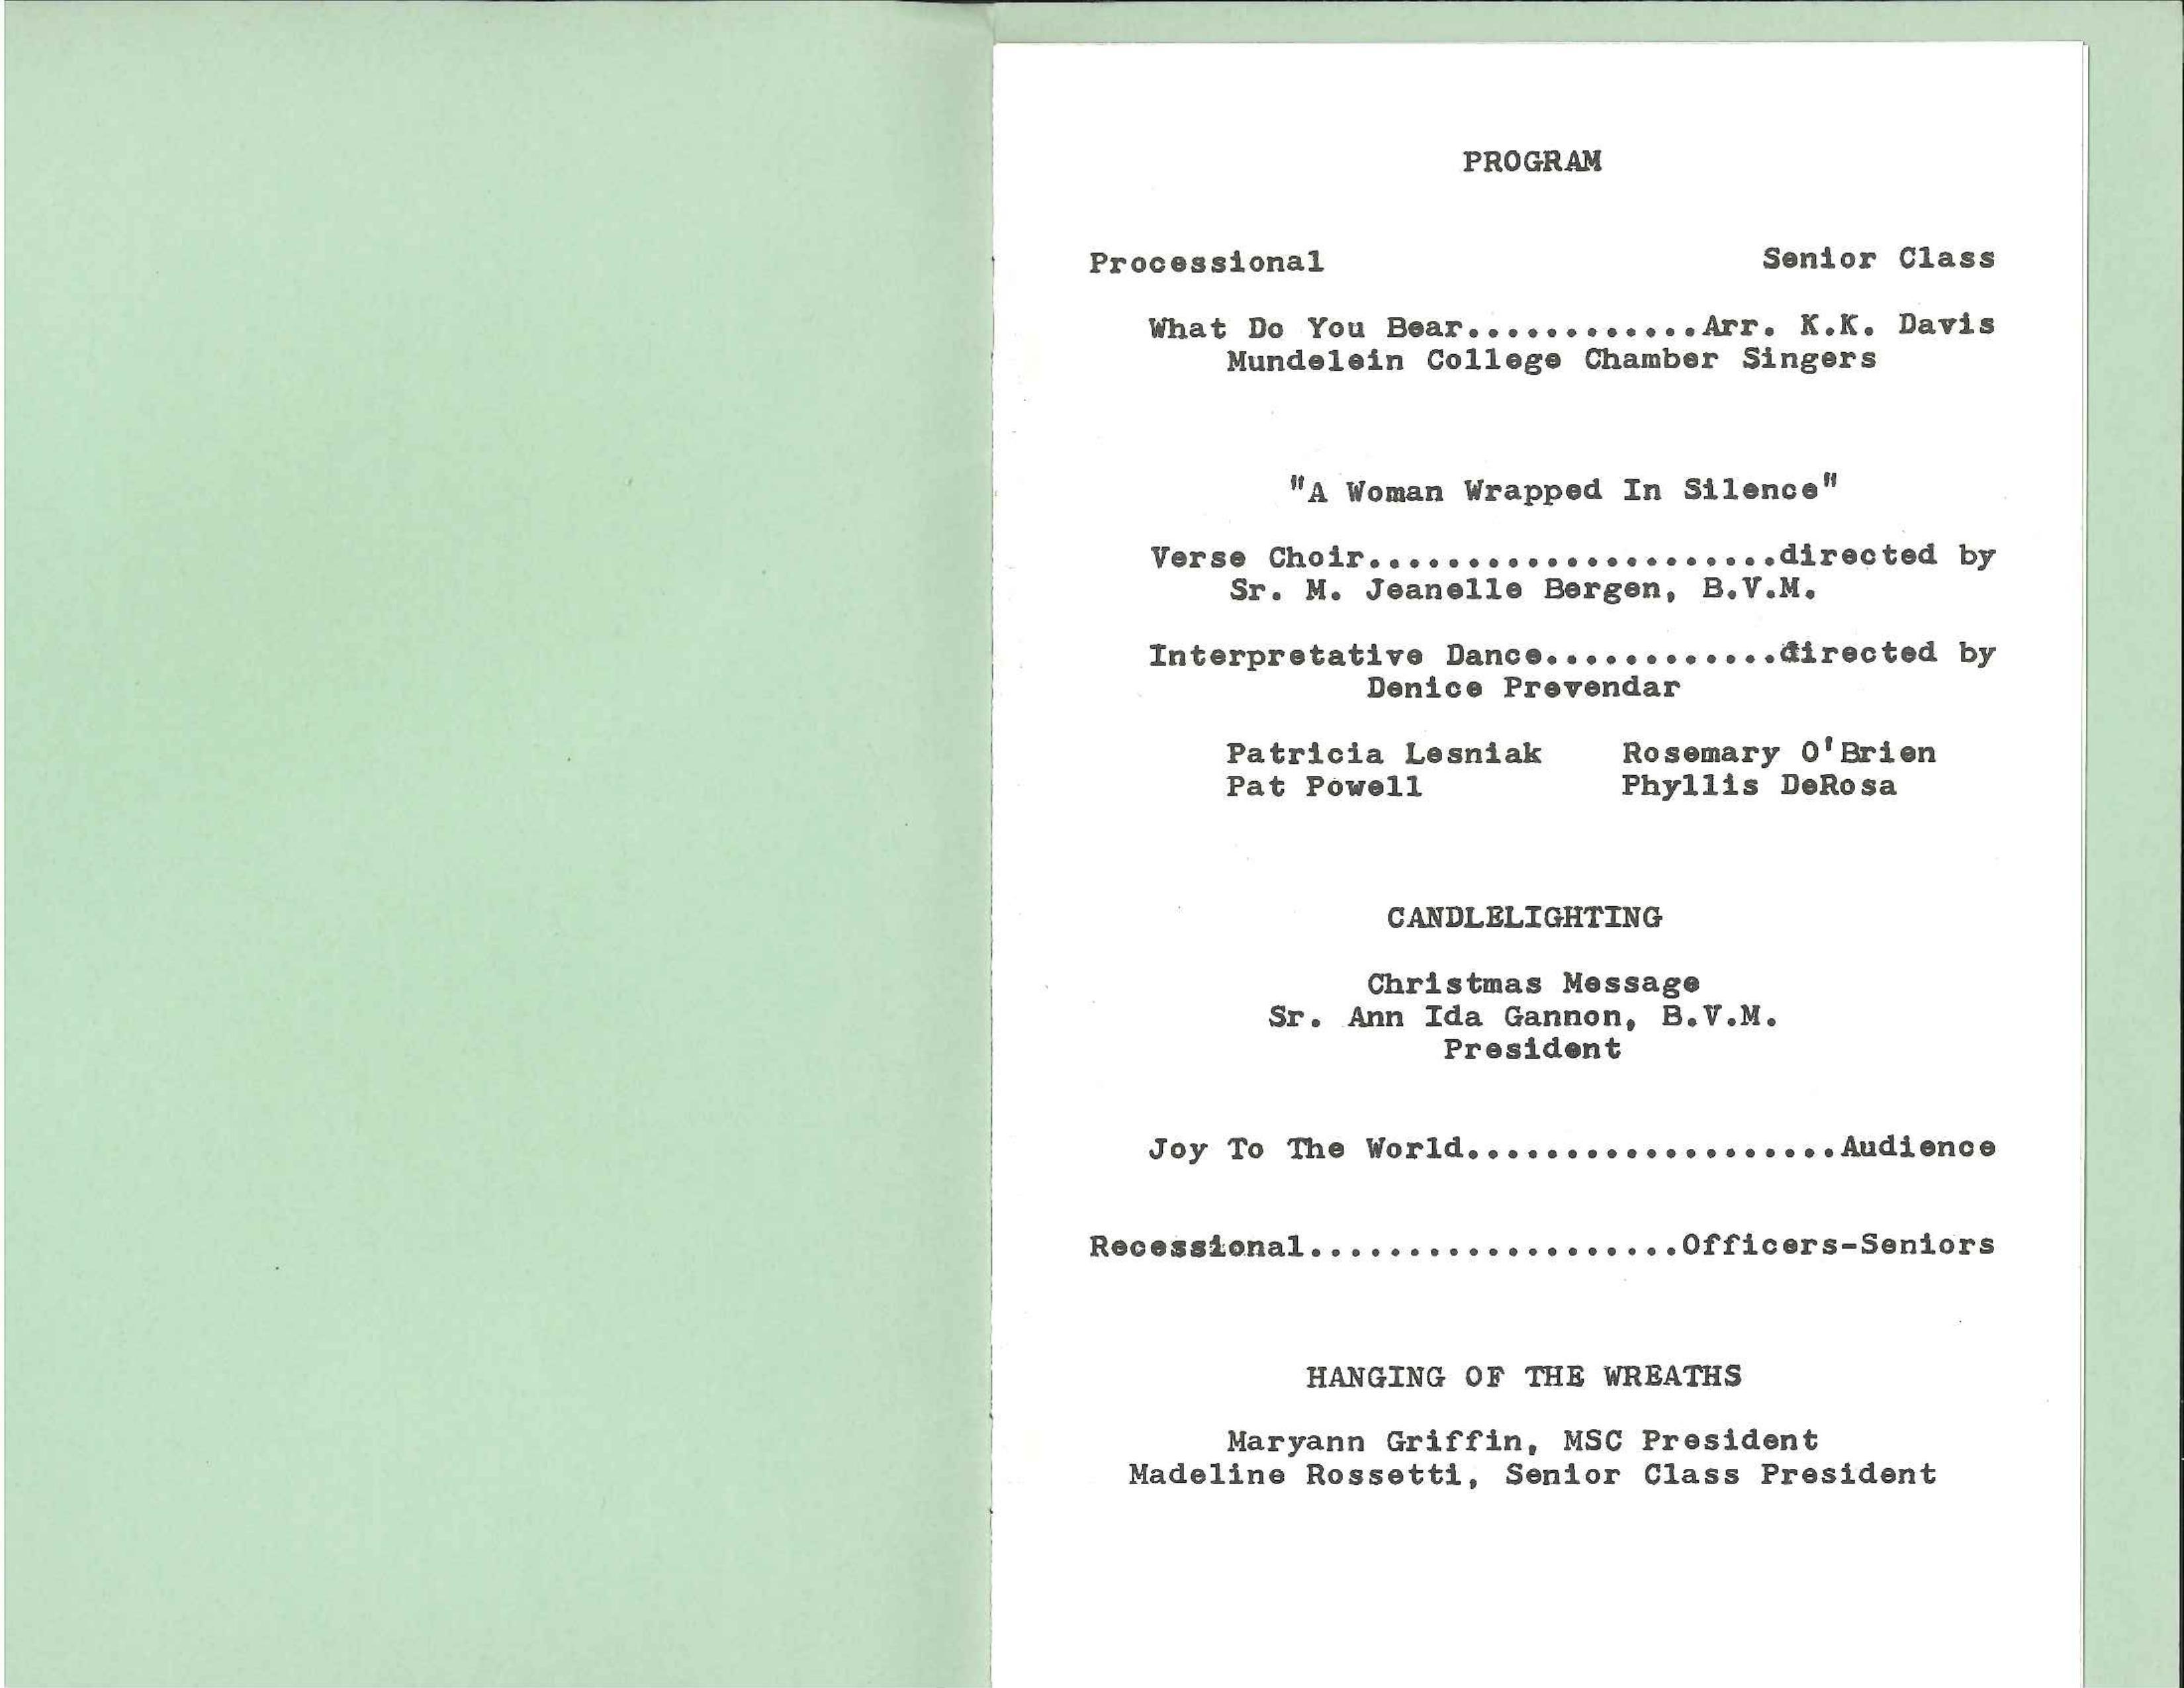 1966 program, page 1